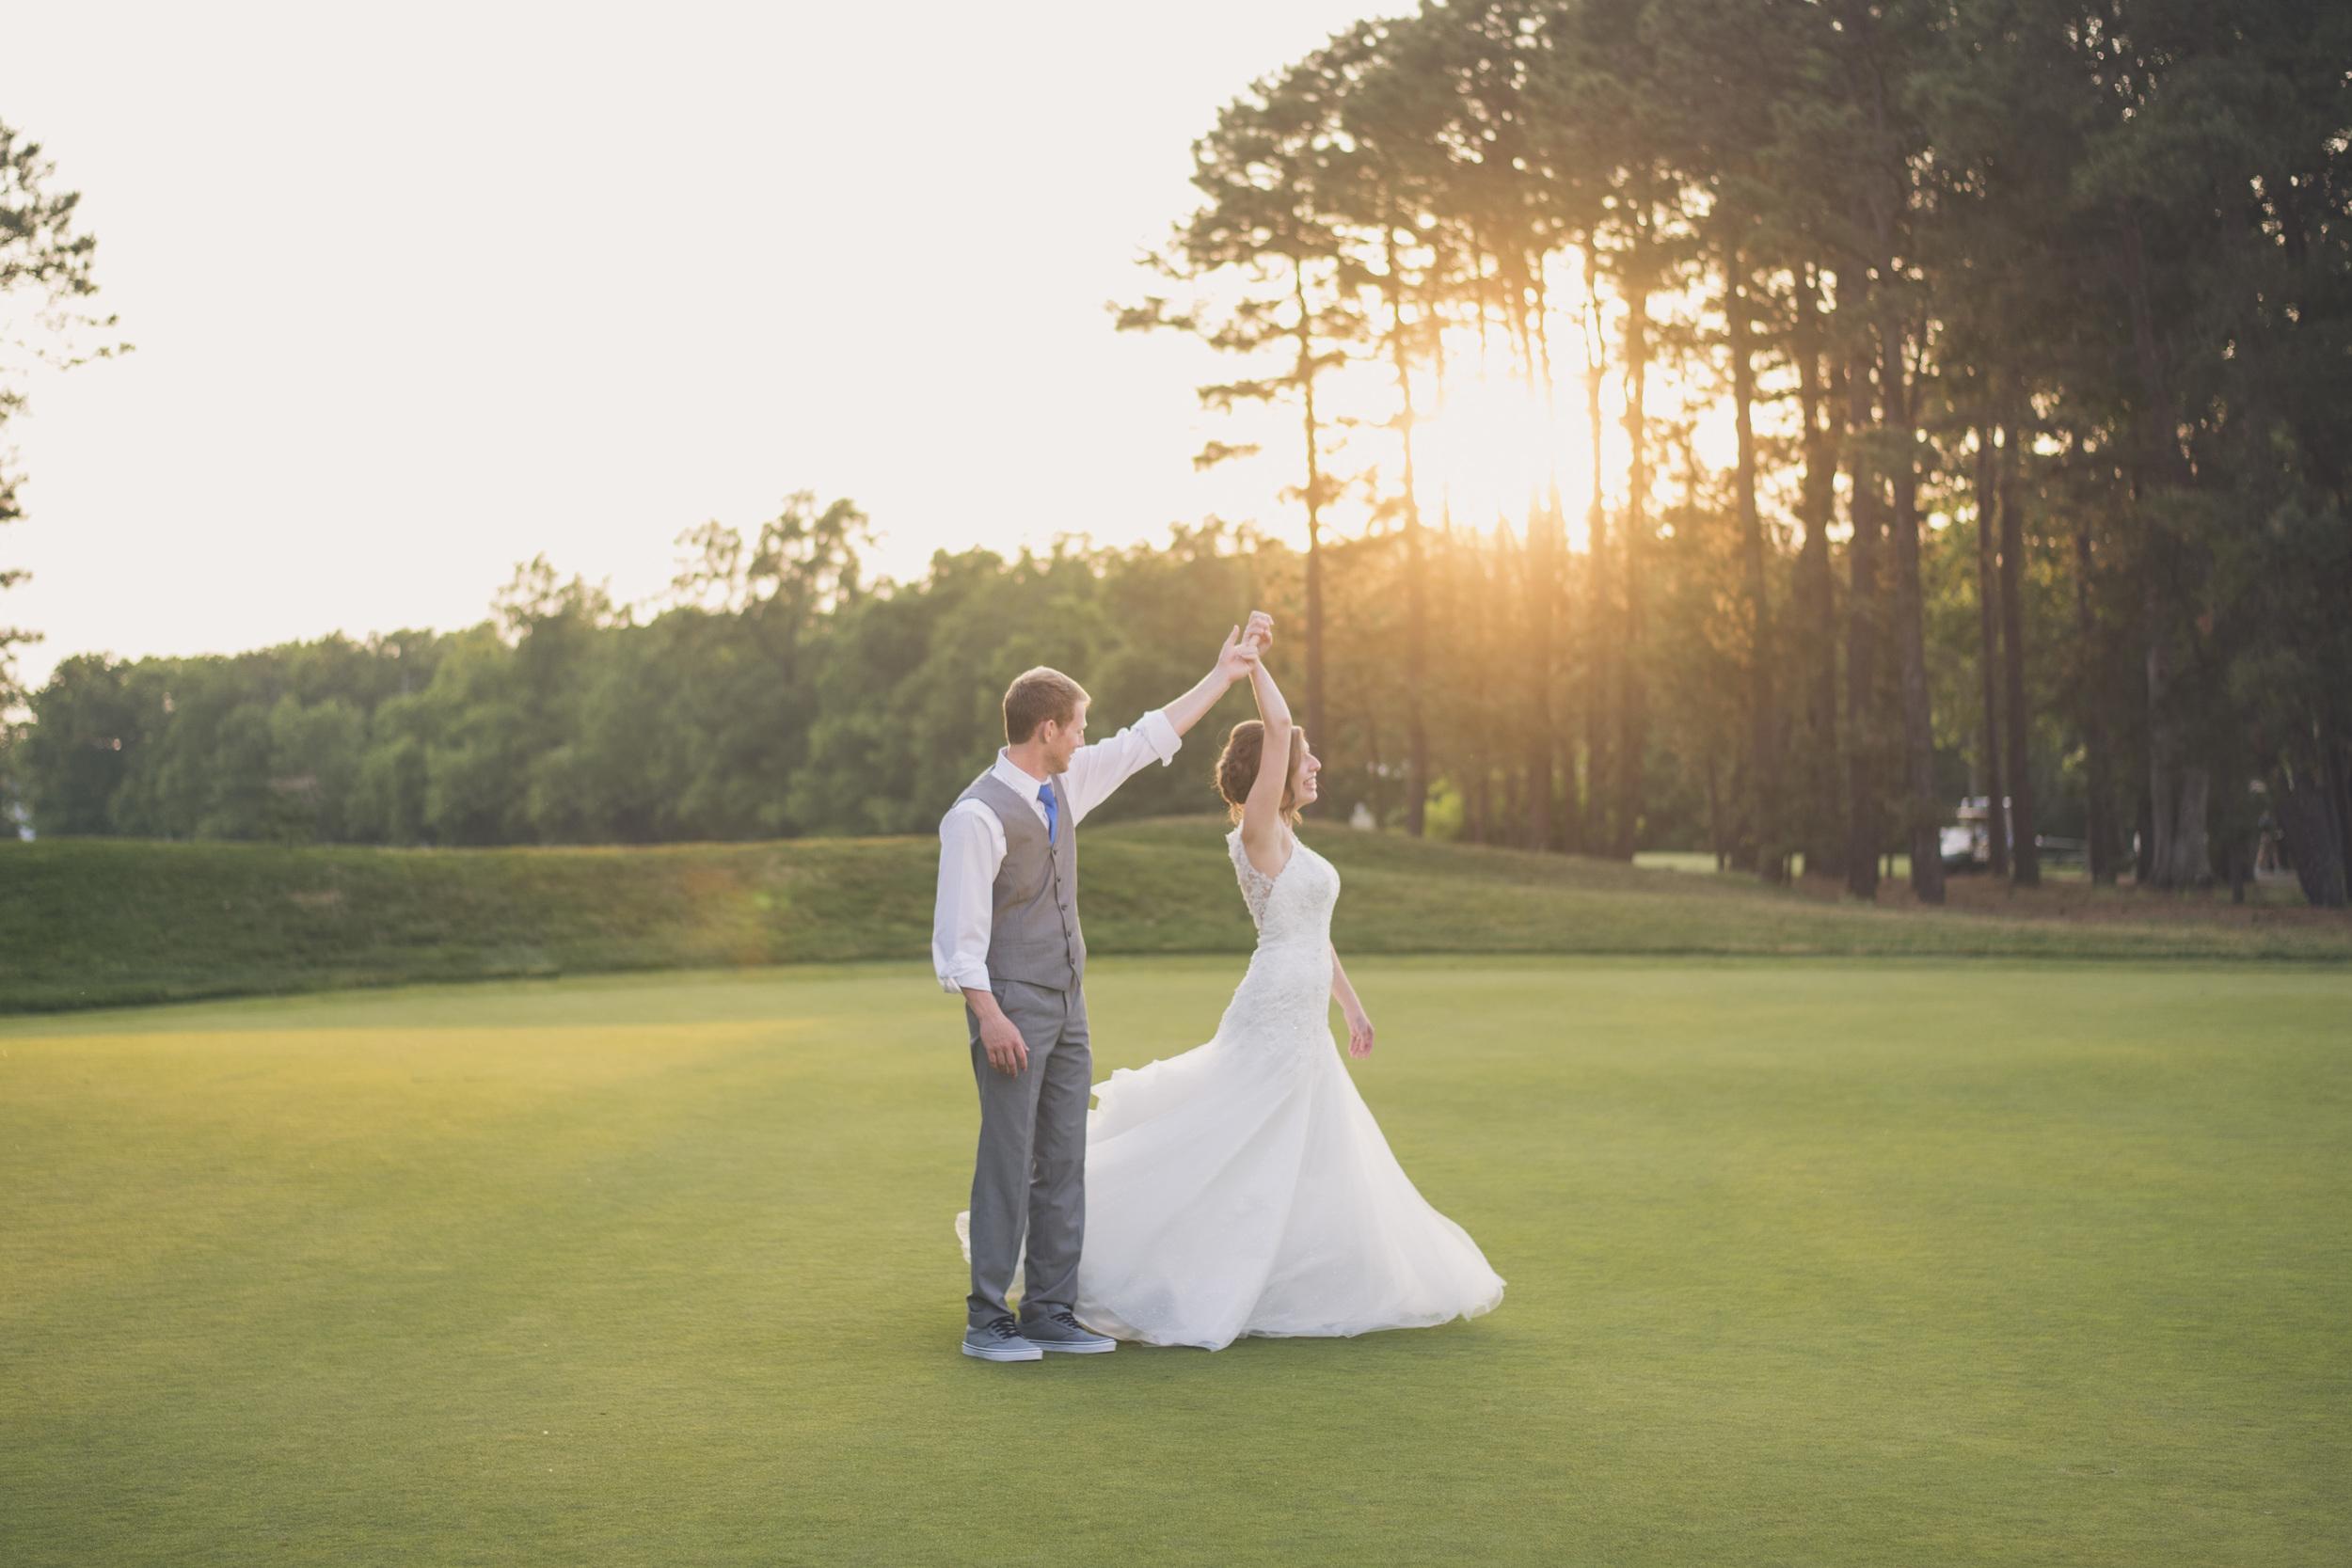 New_jersey_blue_heron_pines_wedding20150529_0602.jpg